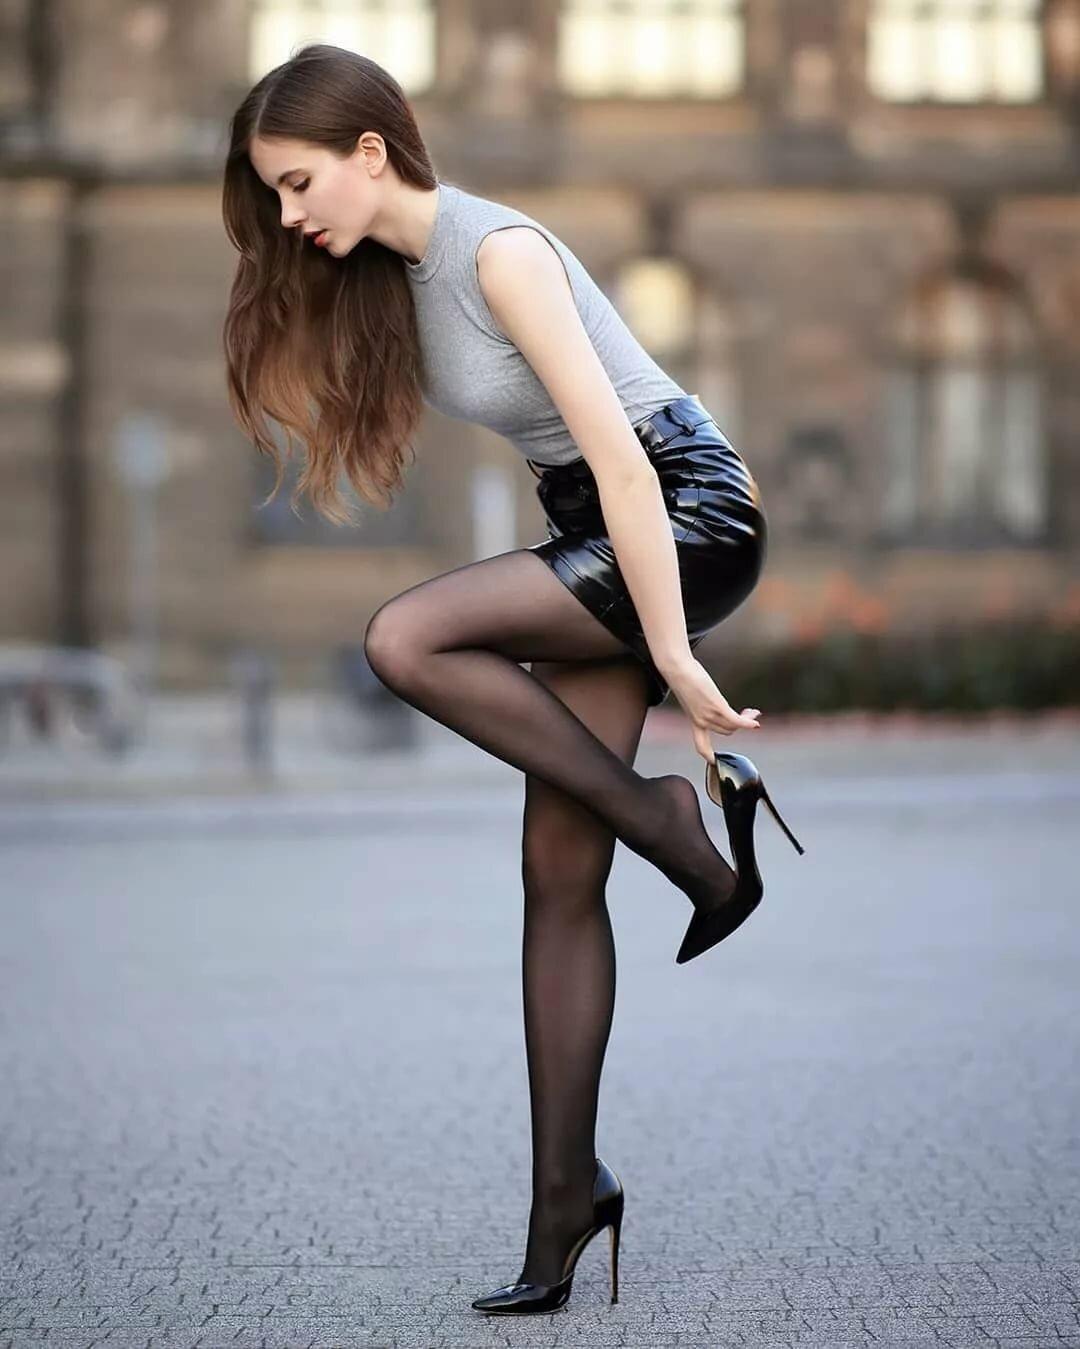 Девушка в колготках мини юбке и каблуках фото